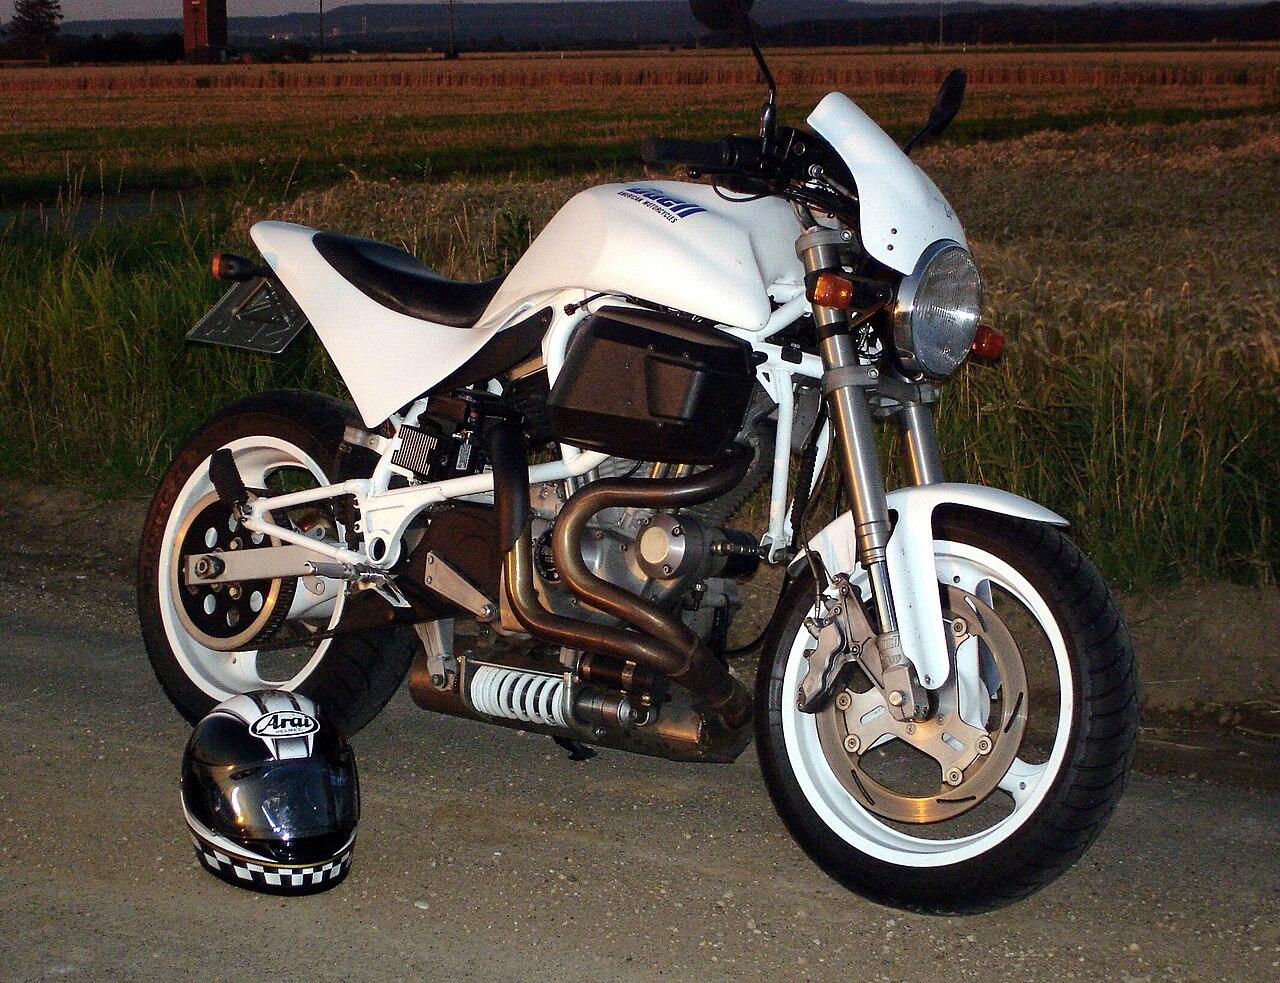 Yamaha MT 15 Wikipedia: 2006 Yamaha MT-OS Concept : Motorcycles